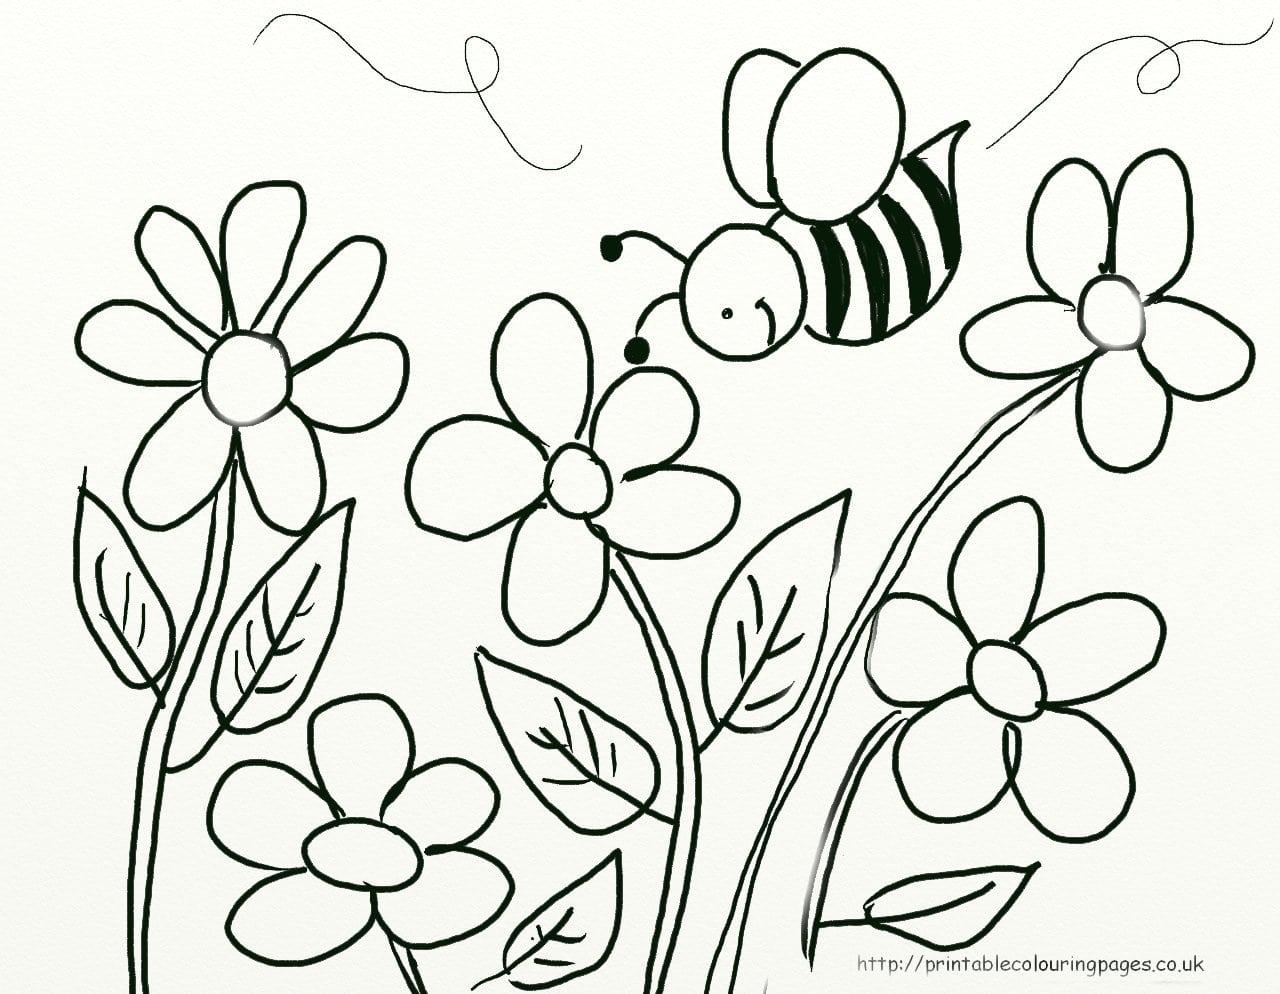 Imagens Para Colorir De Flores